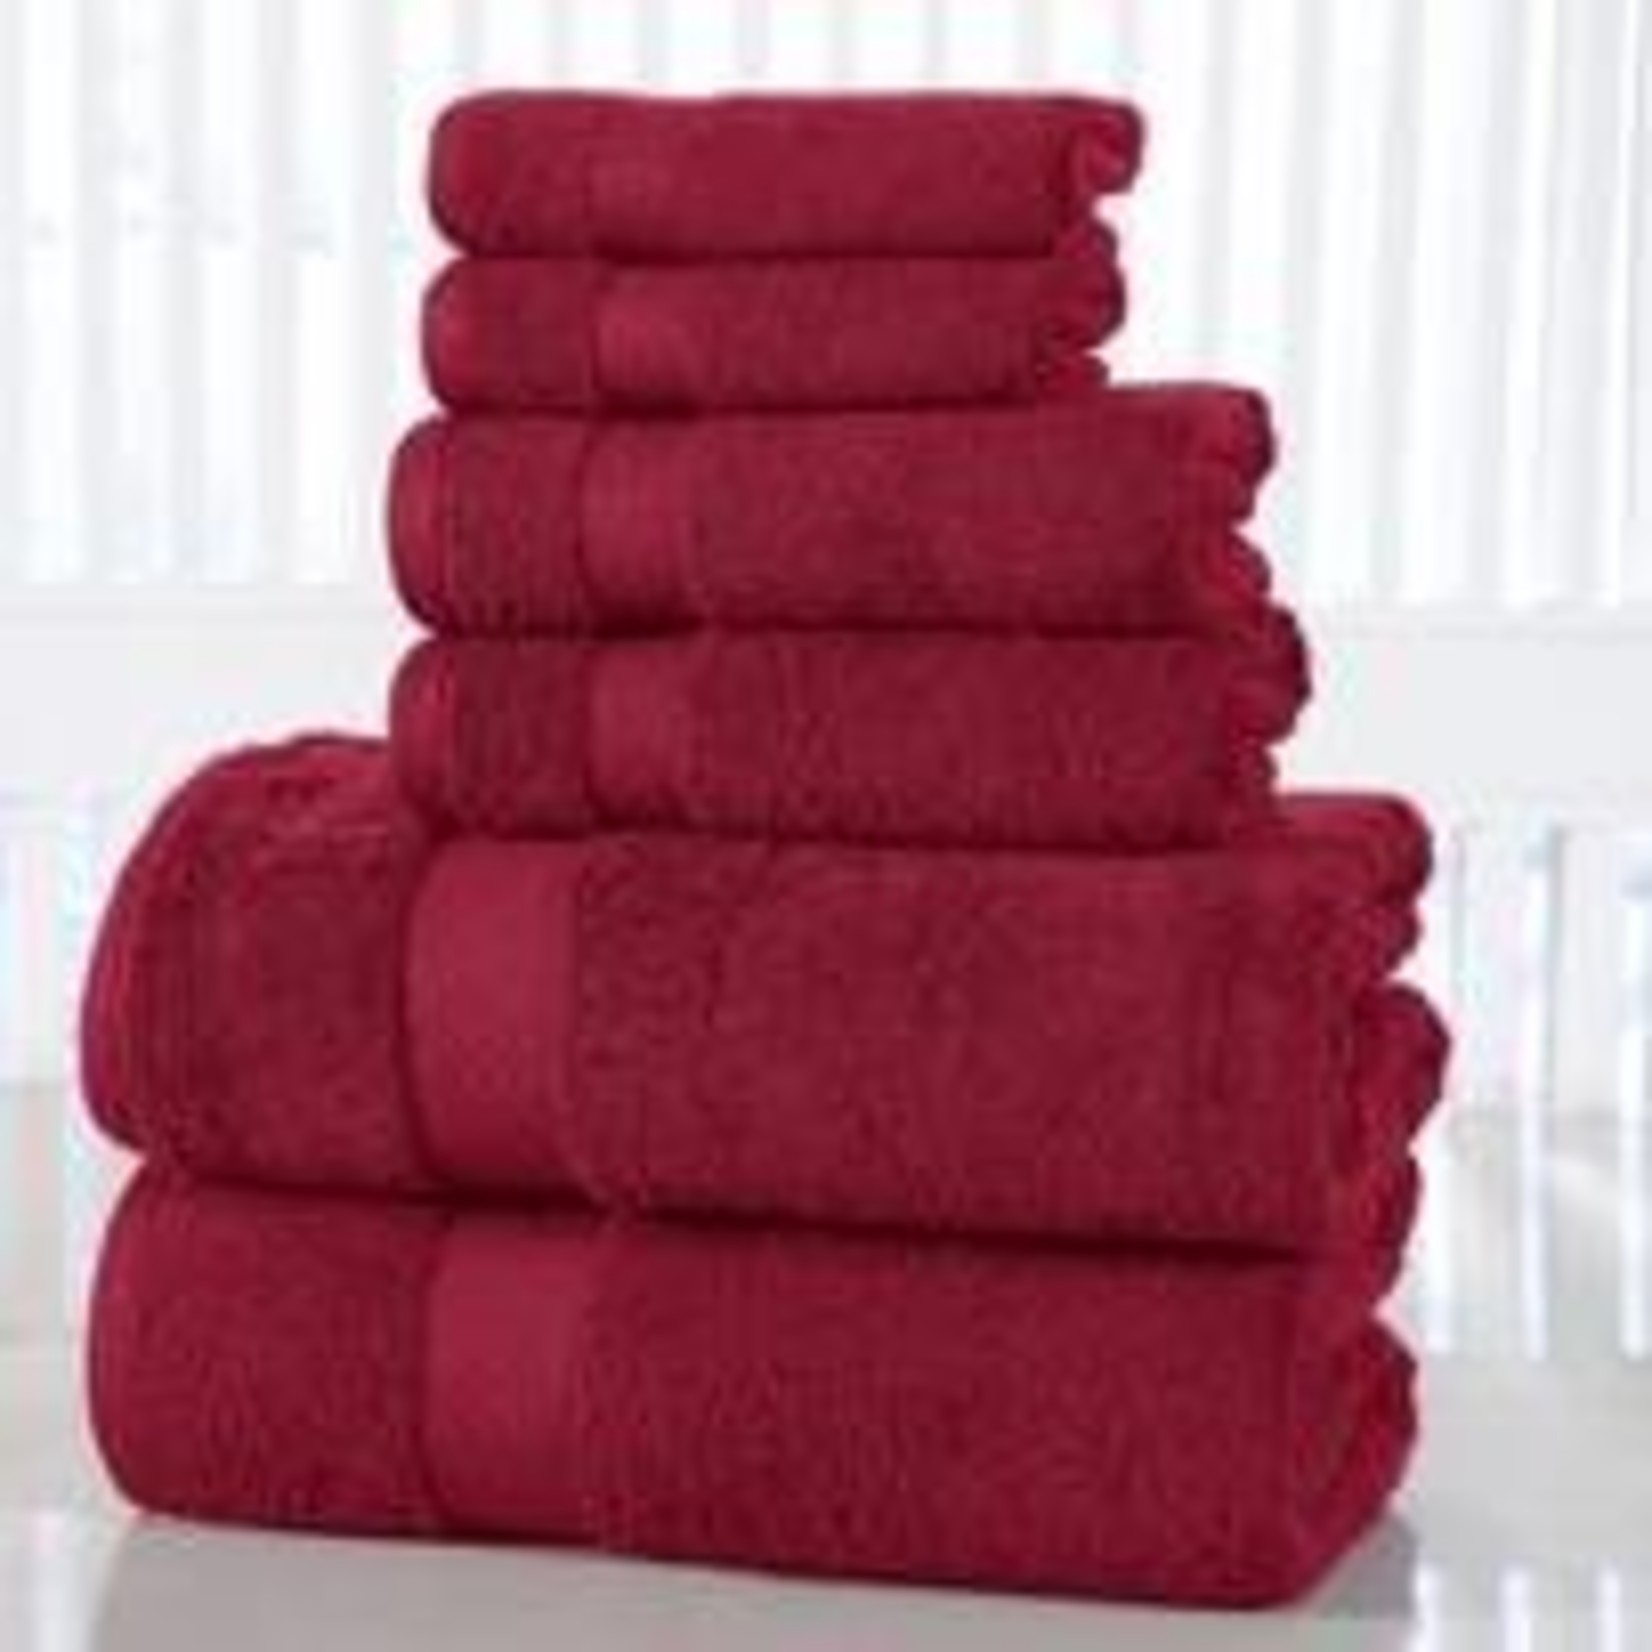 *Lucinda Luxurious 6 Piece 100% Cotton Towel Set - Garnet Red - Final Sale